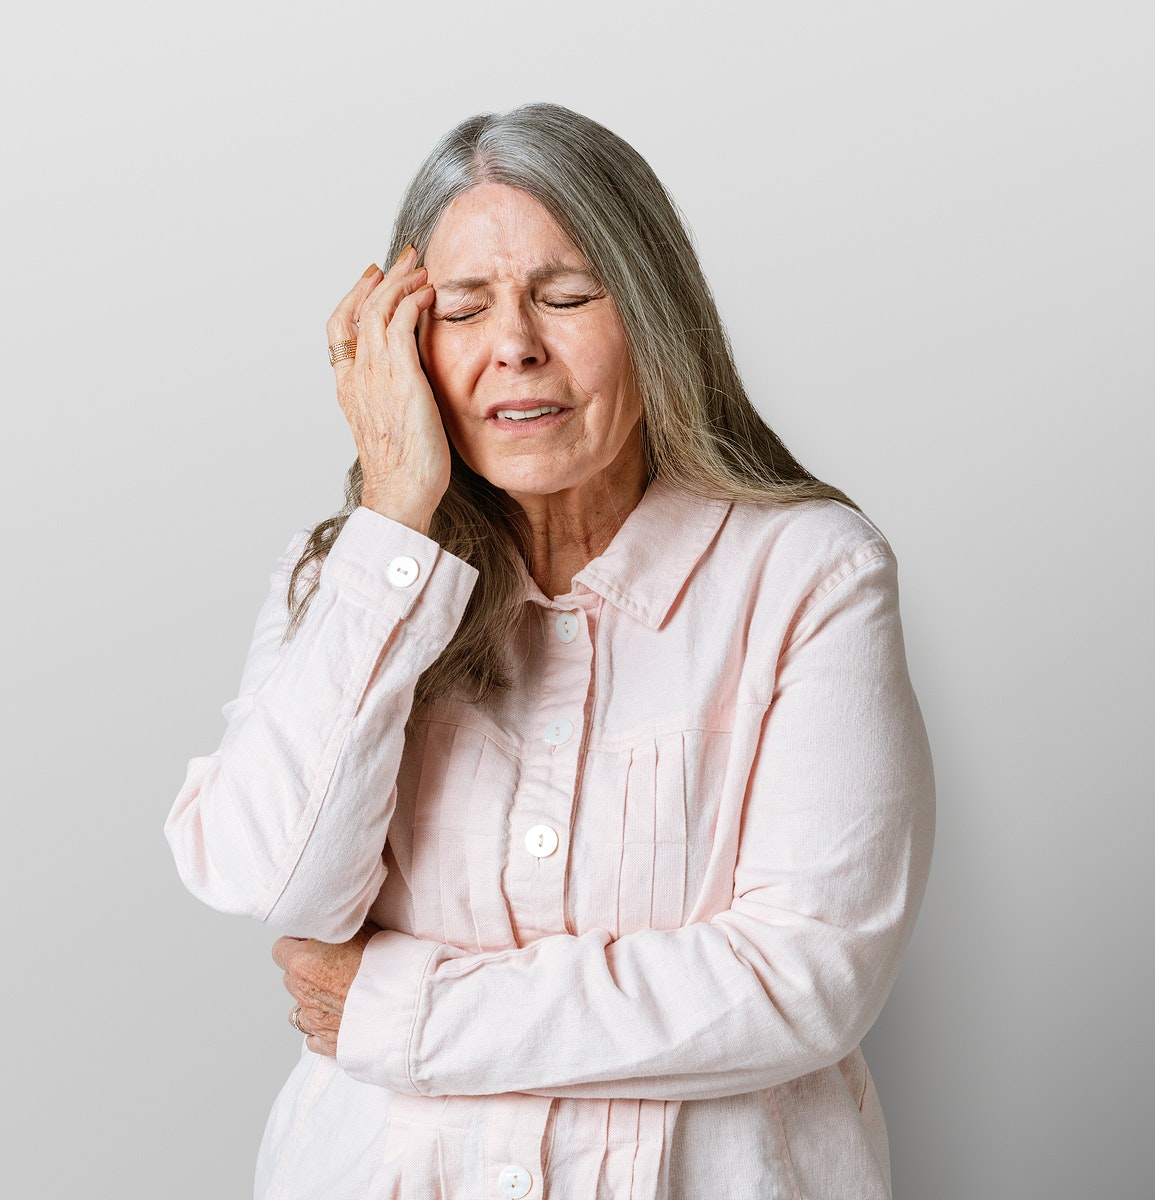 Sick senior woman having a headache during coronavirus pandemic mockup